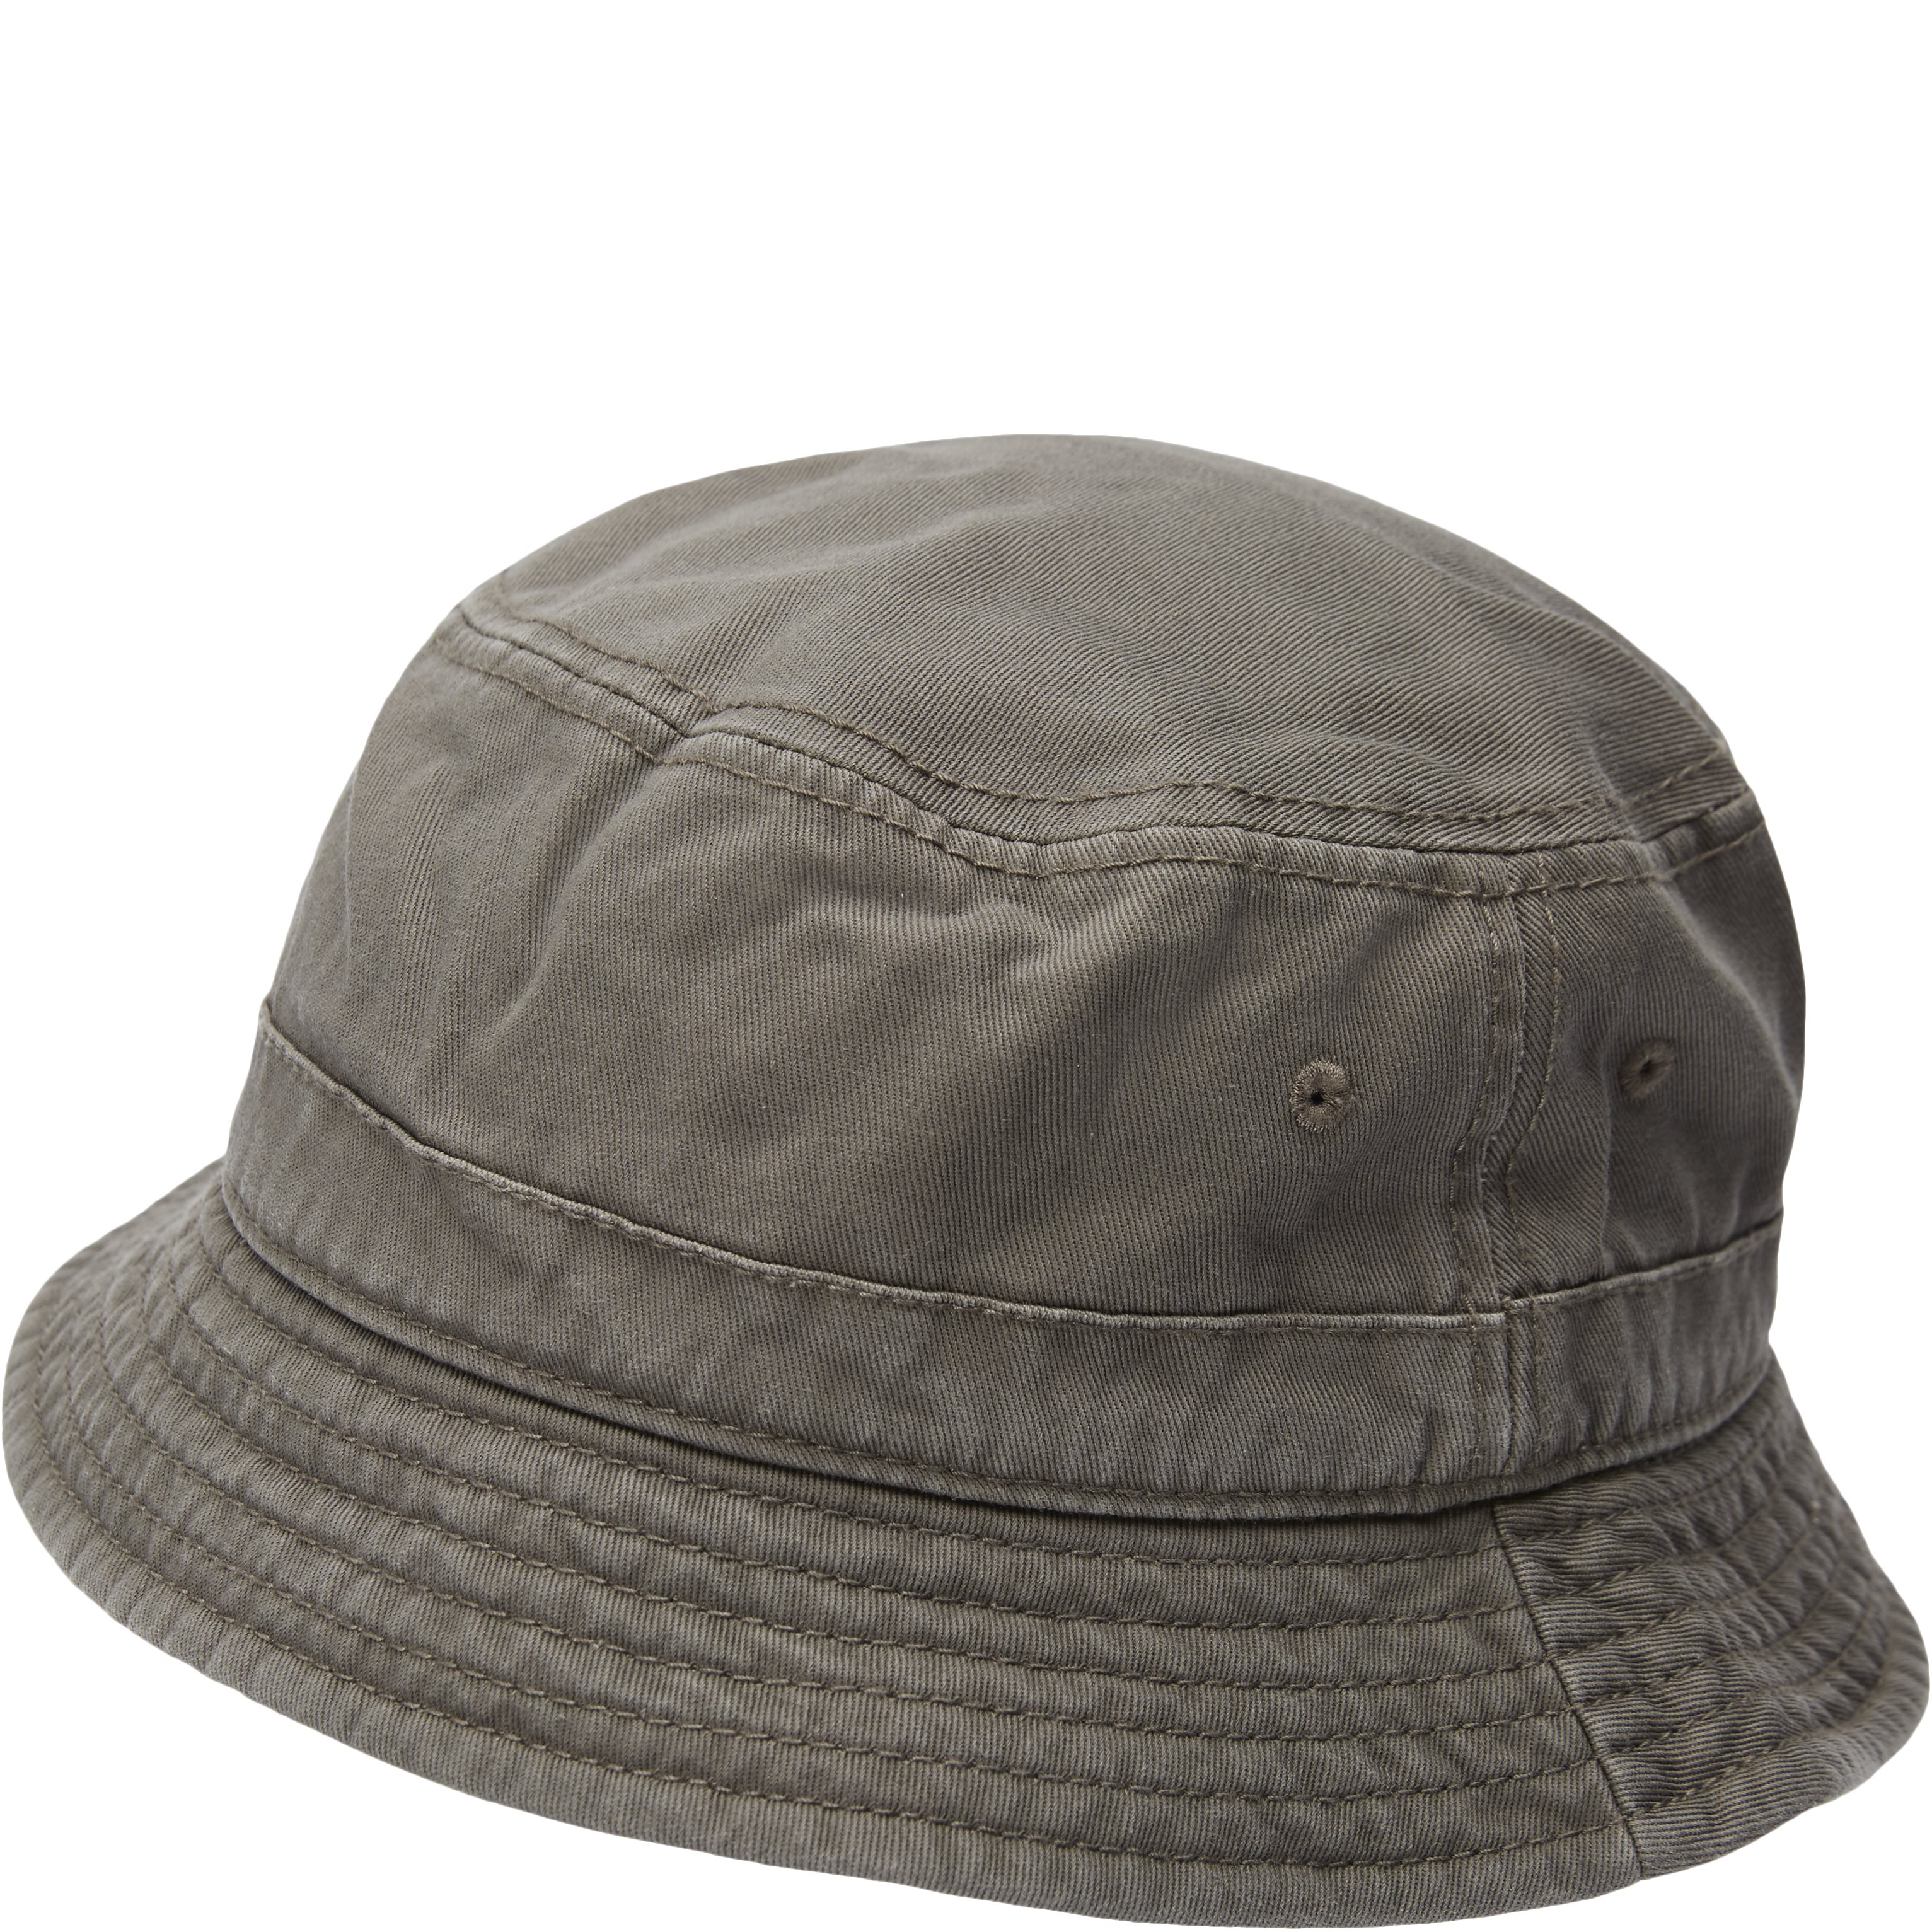 Atlantis Bucket Hat - Caps - Grøn